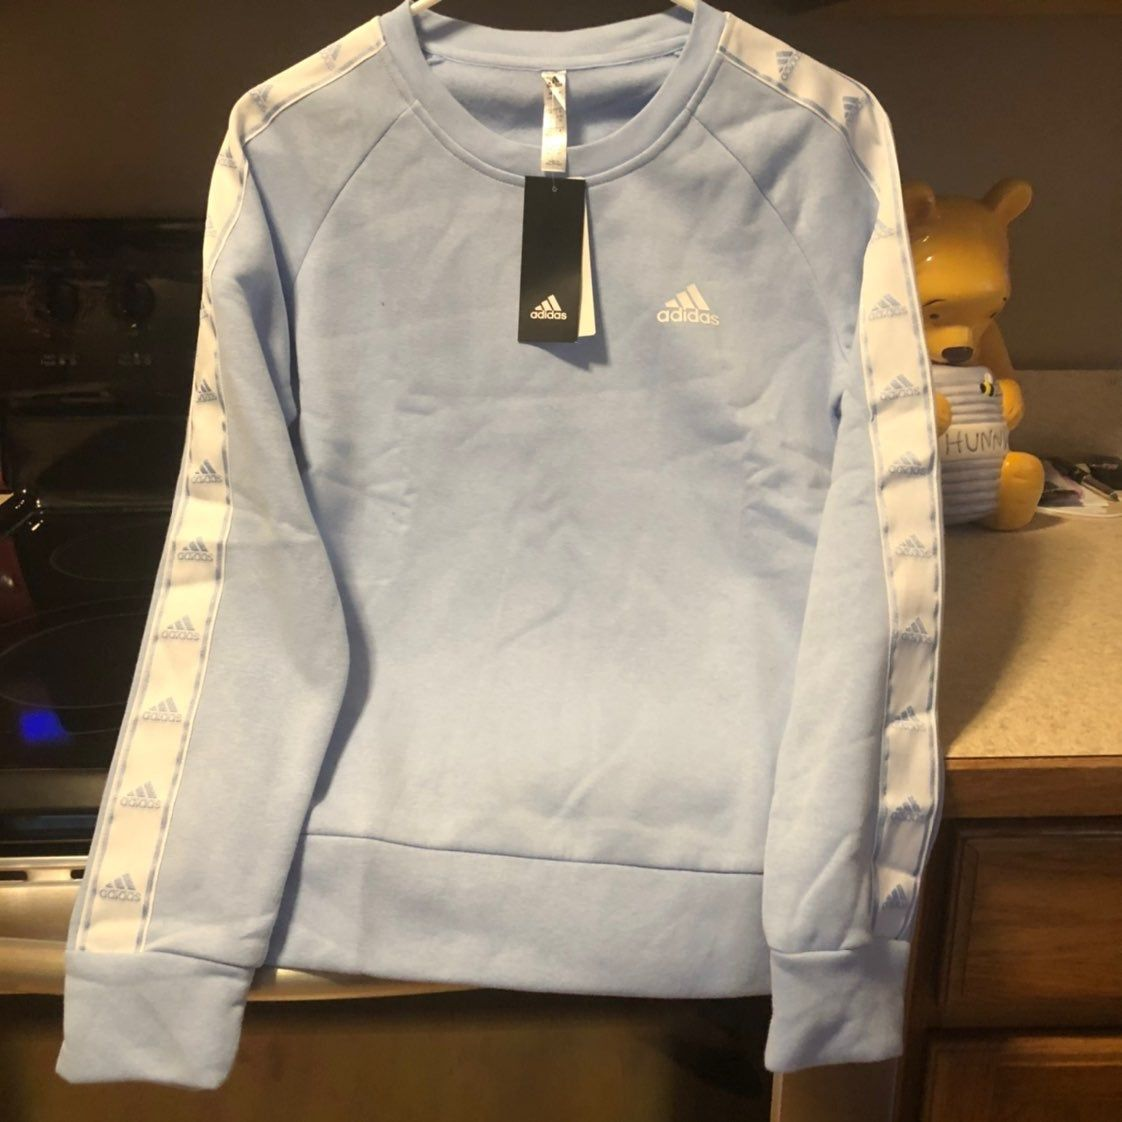 Nwt Women S New Light Blue Adidas Sweatshirt Size Small Adidas Sweatshirt Sweatshirts Blue Adidas [ 1122 x 1122 Pixel ]